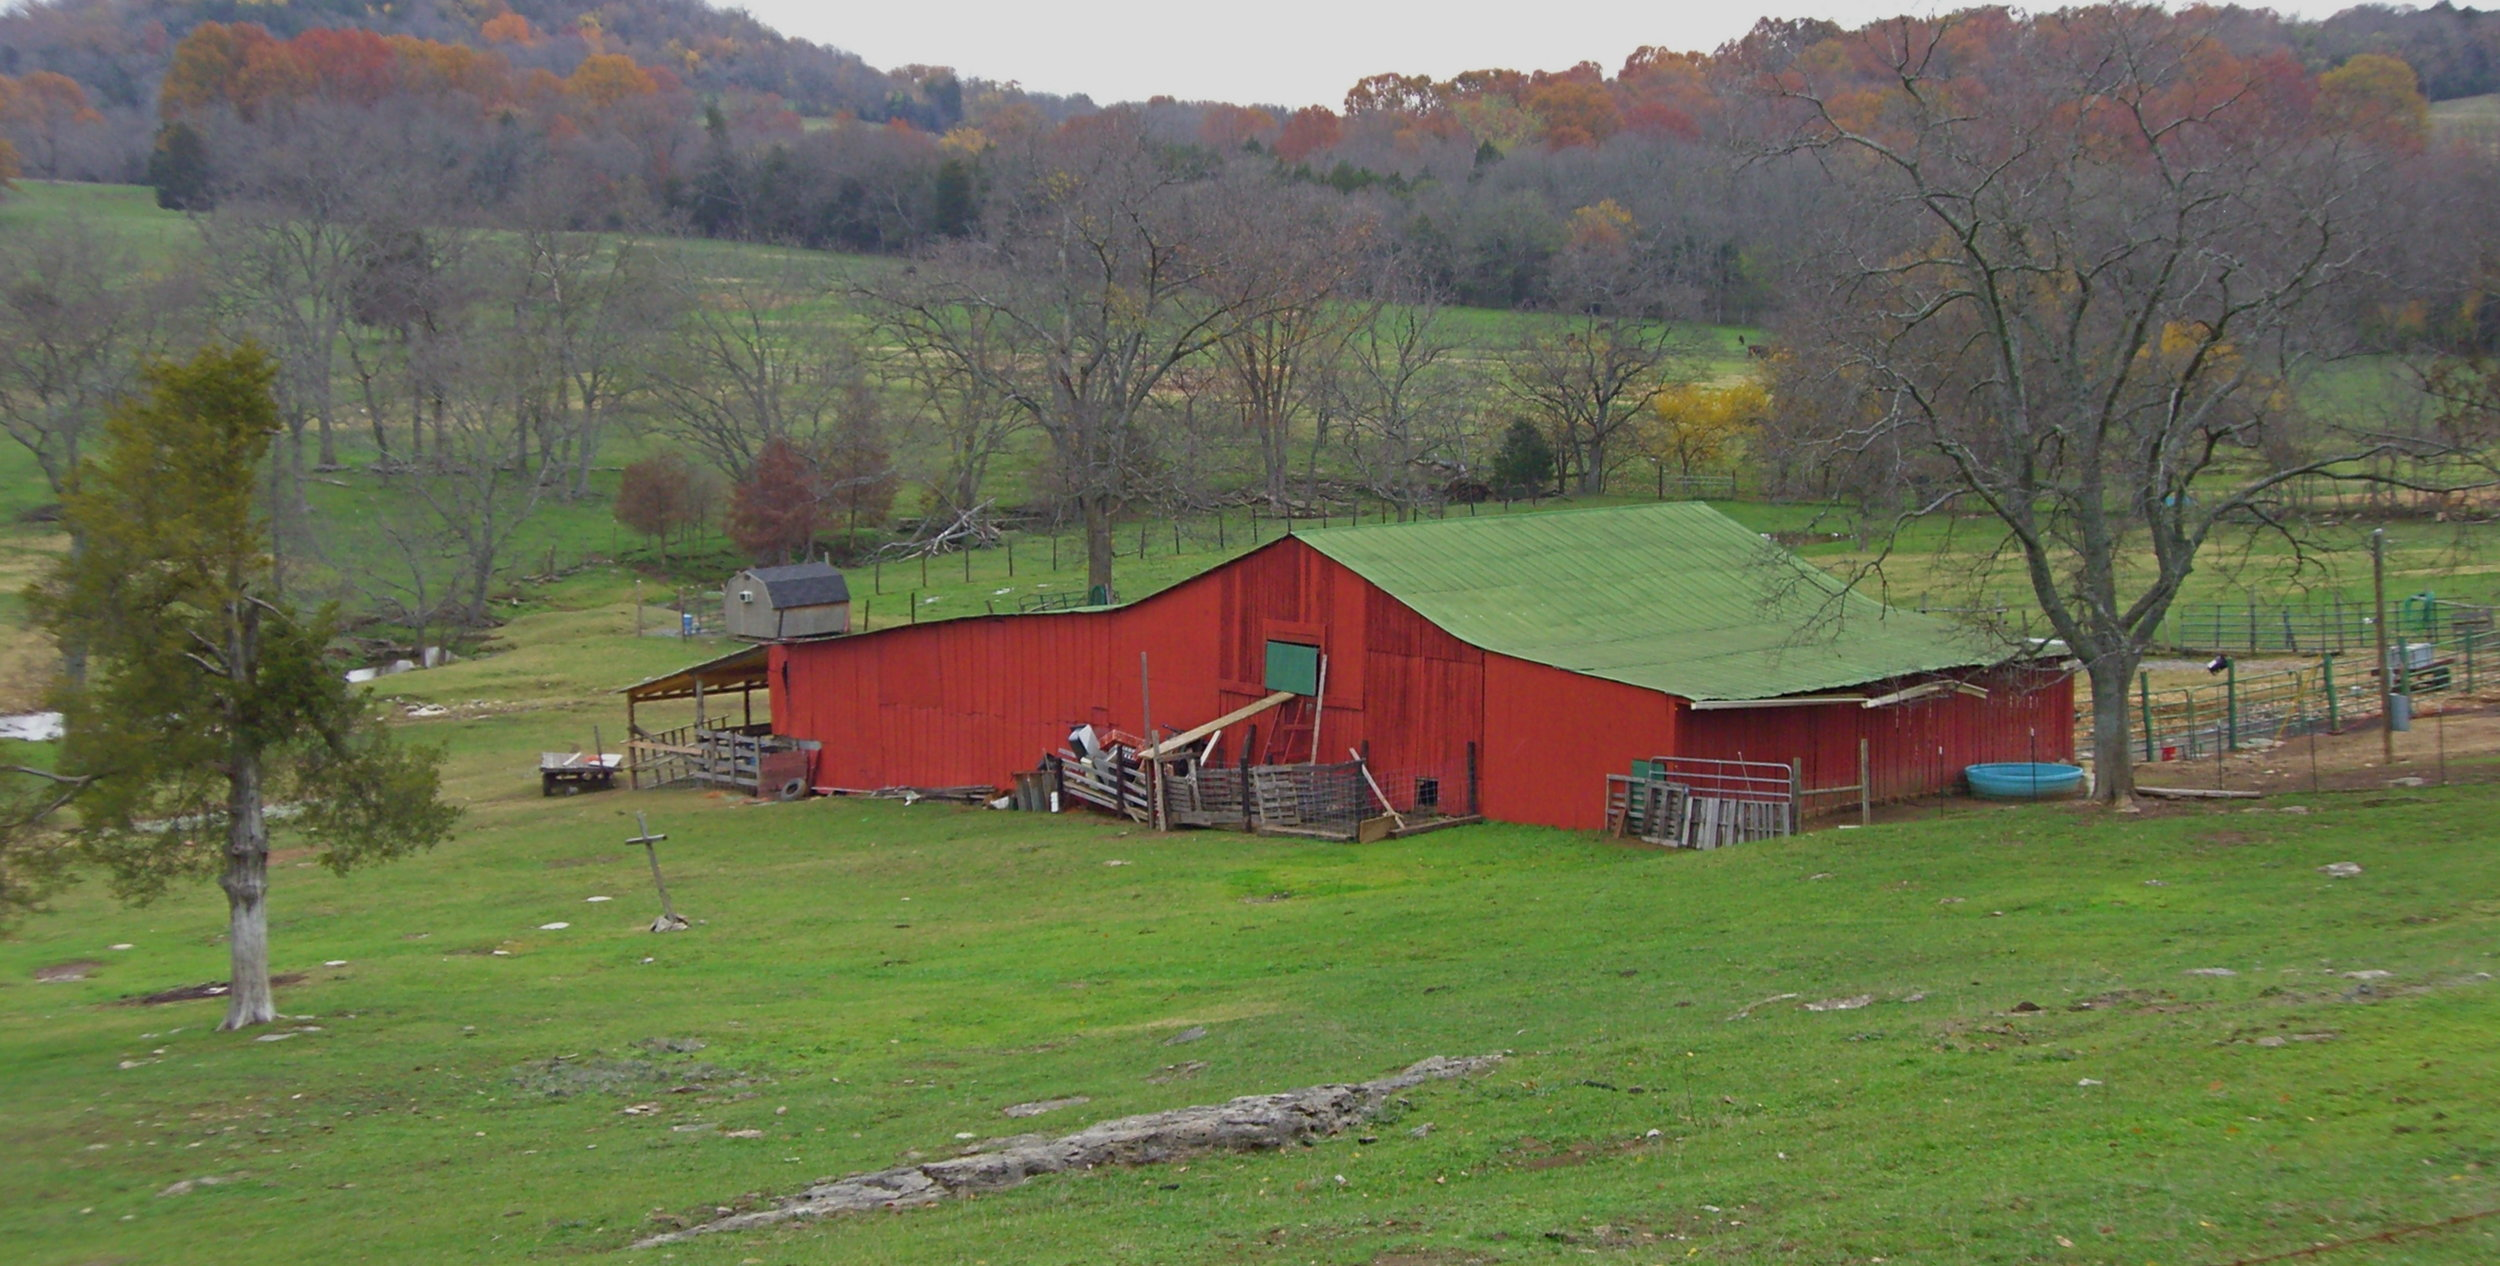 Red_Barn,_Coleman_Rd.,_Williamson_County,_TN,_USA_-_panoramio.jpg